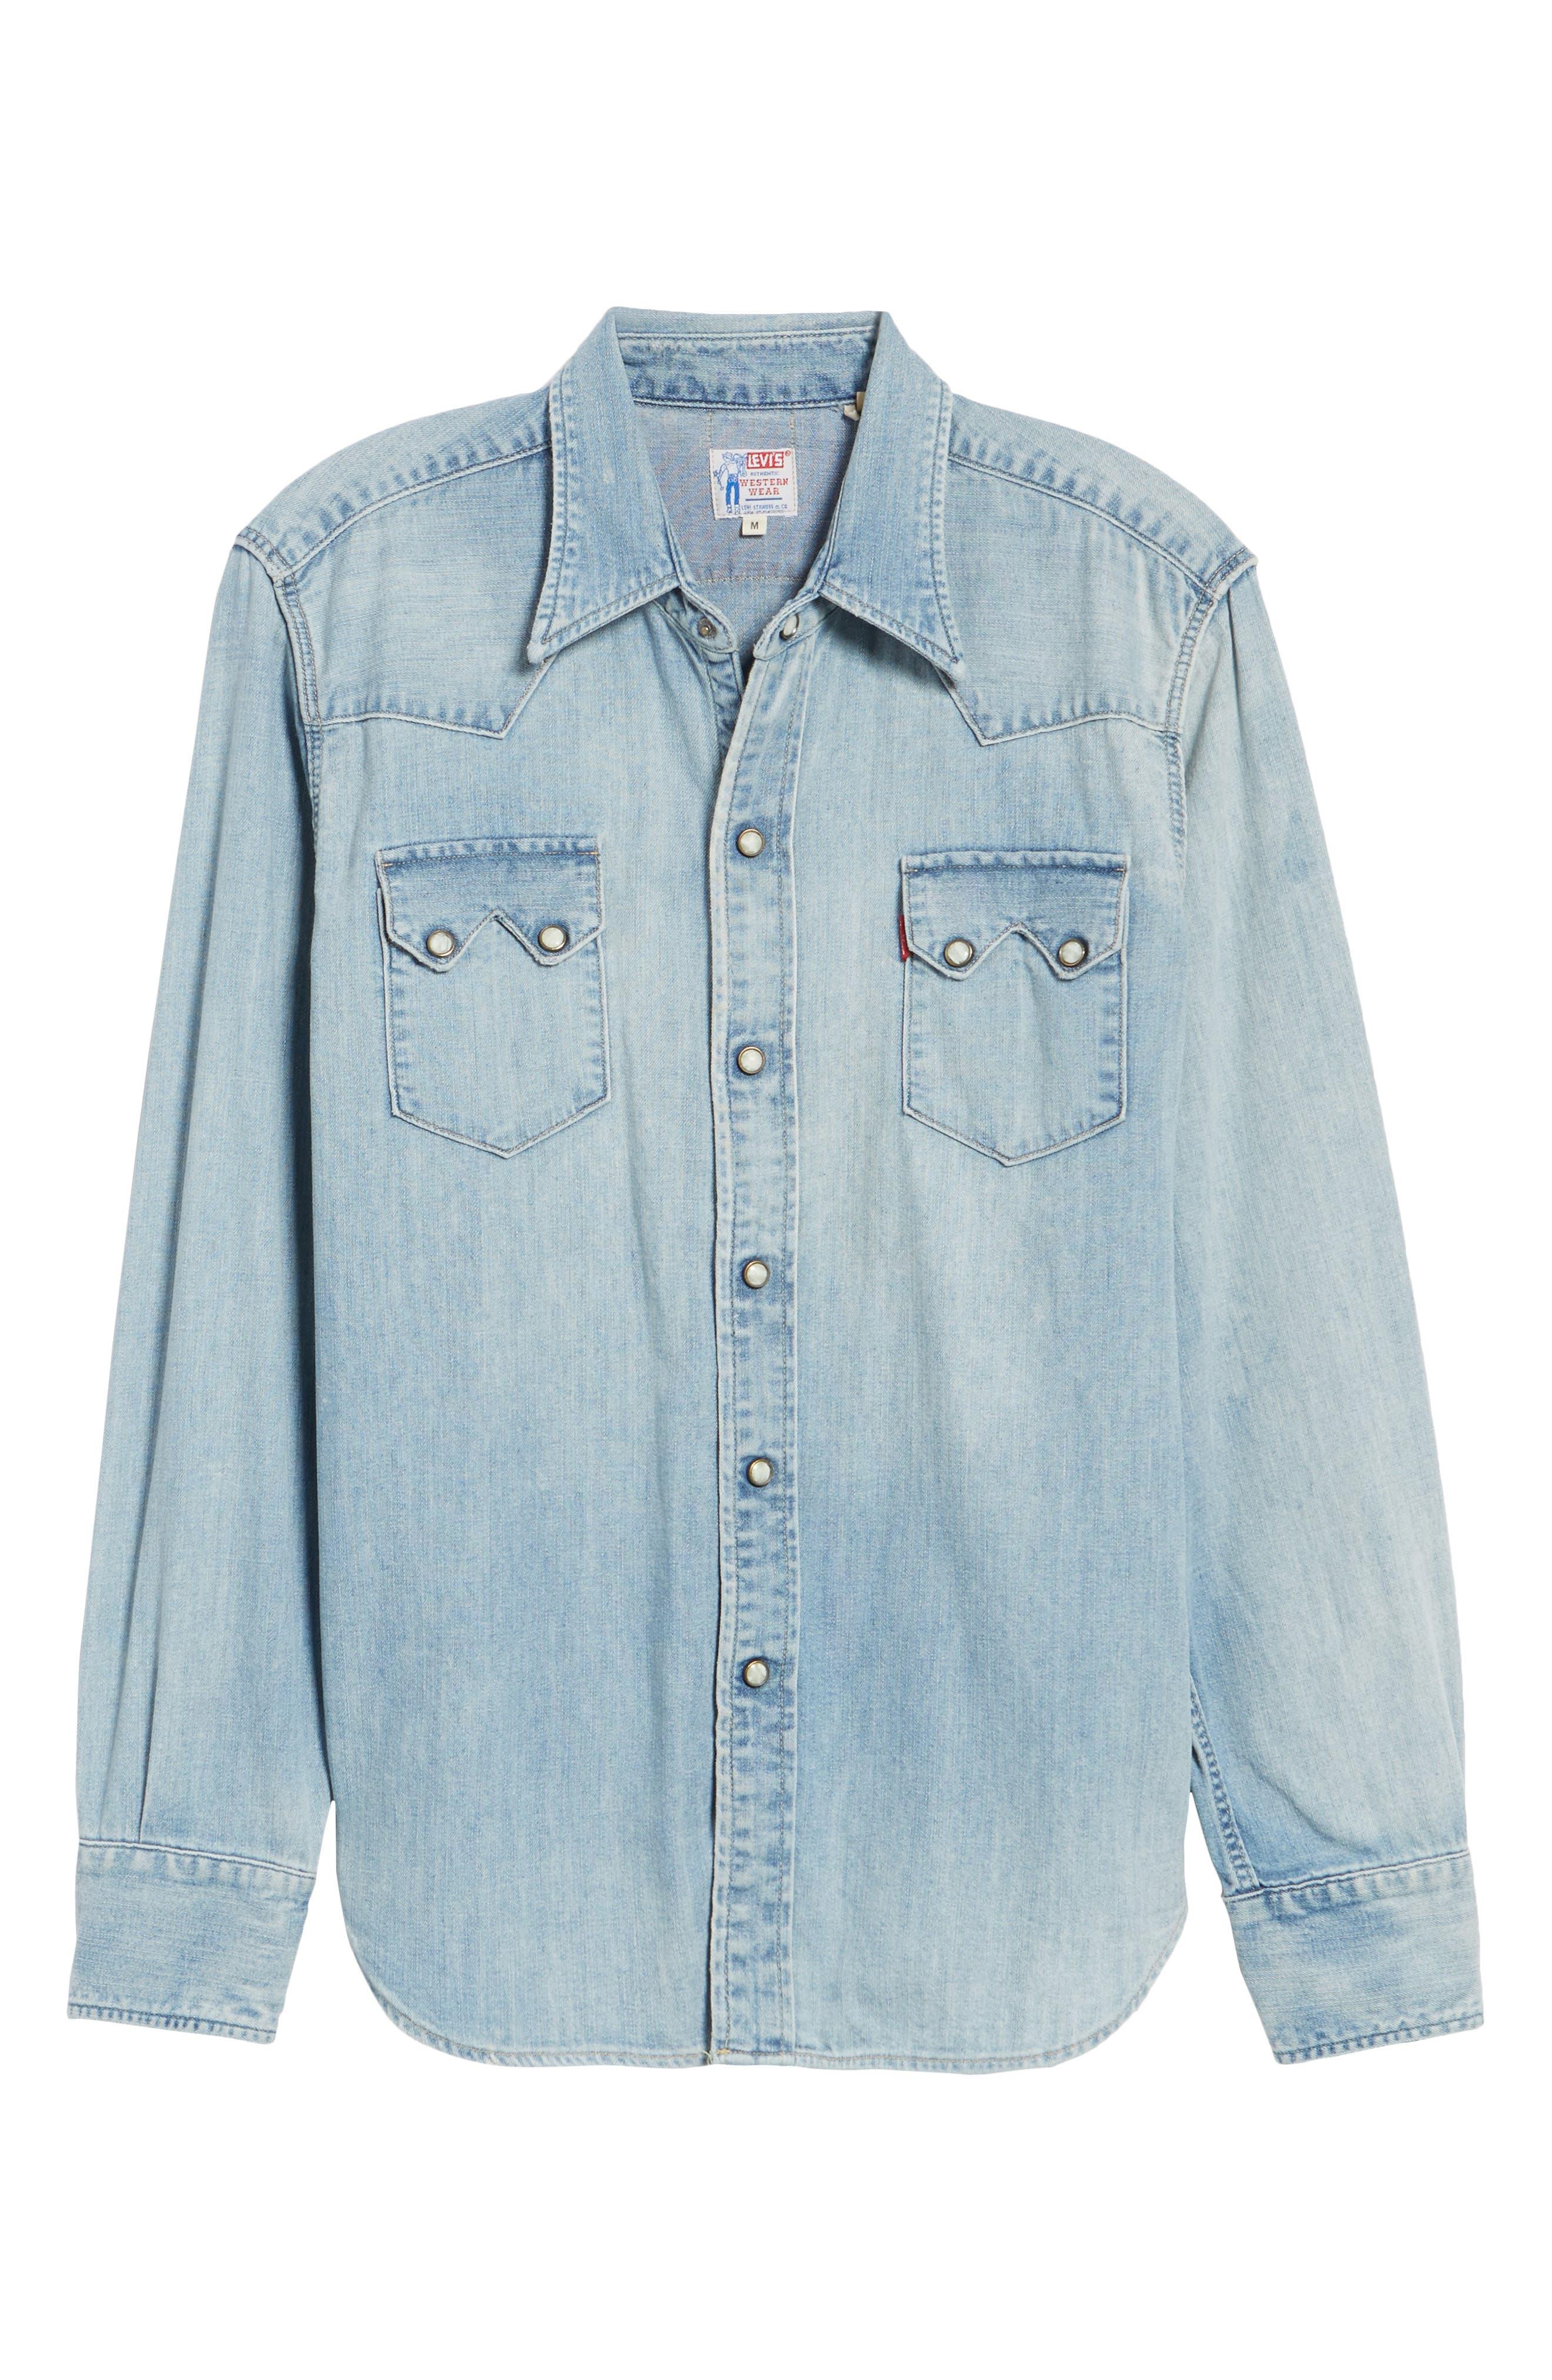 1955 Sawtooth Trim Fit Denim Western Shirt,                             Alternate thumbnail 6, color,                             Blue